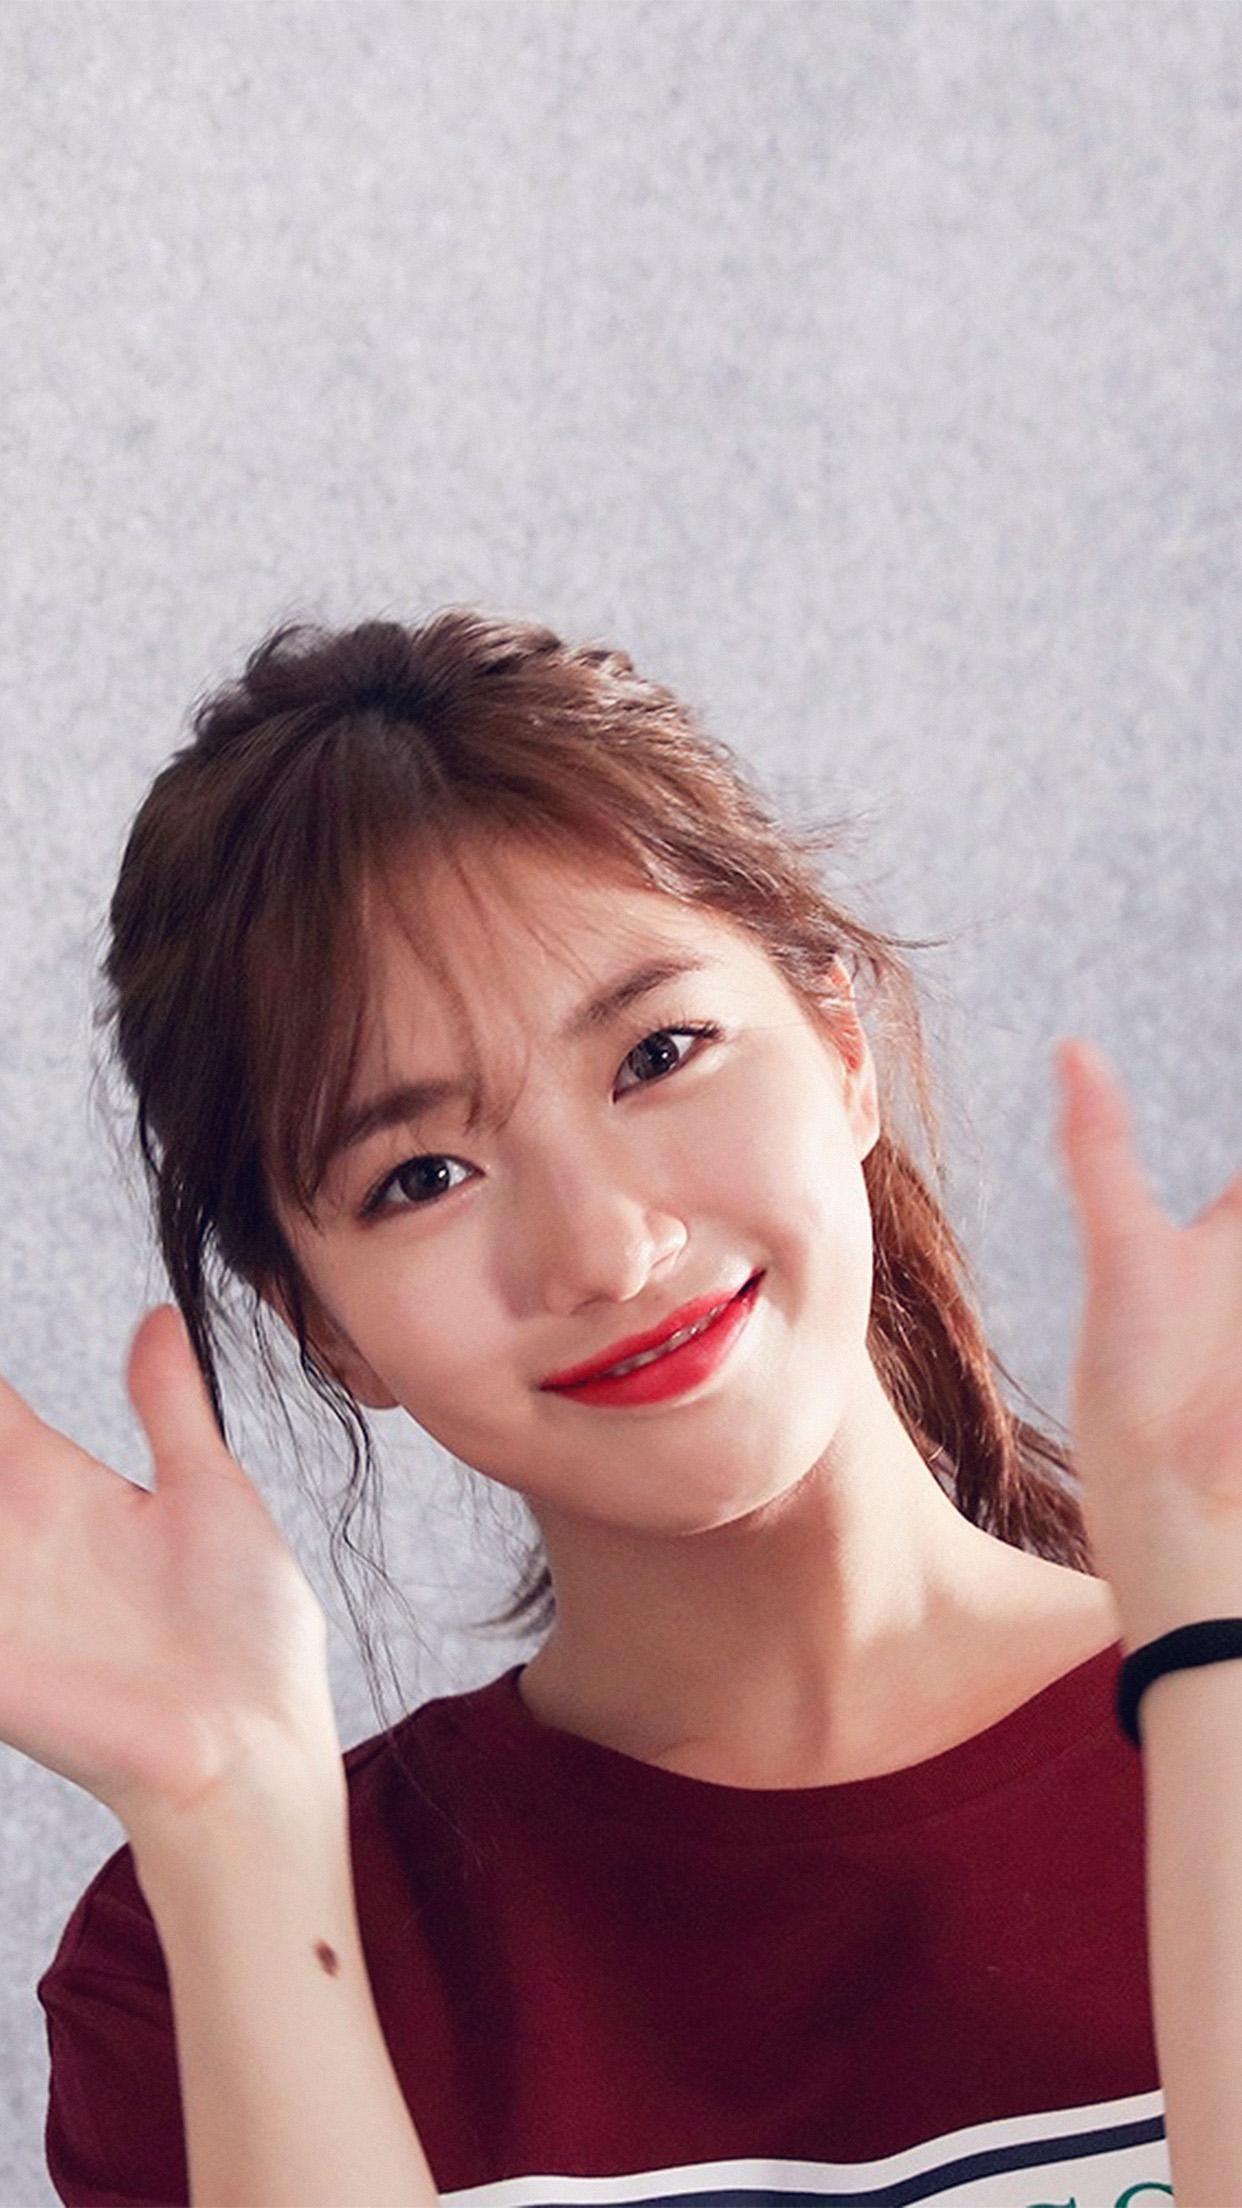 Suji Kpop Cute Smile